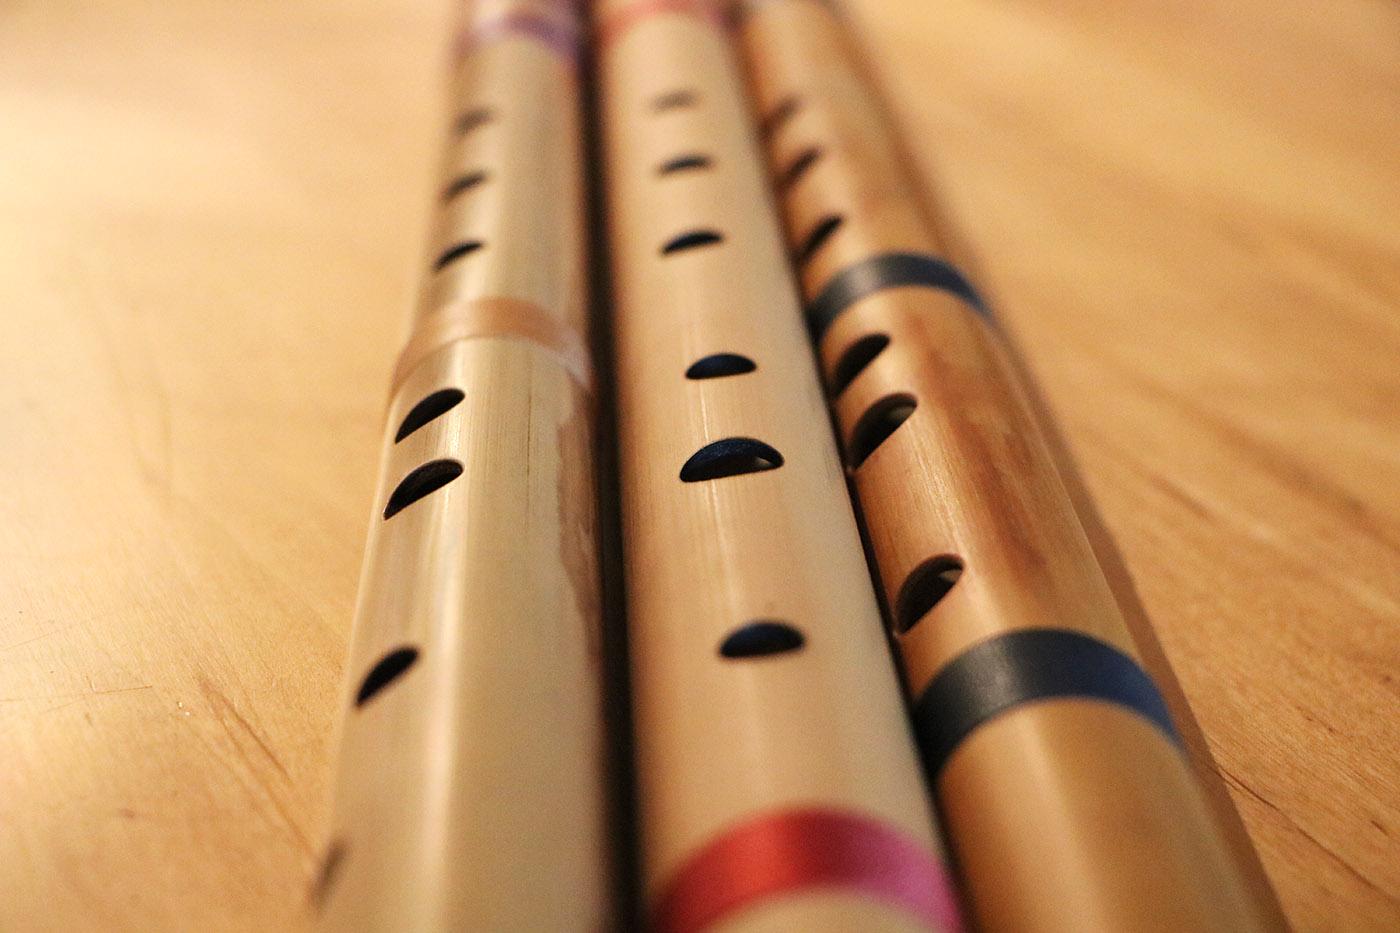 Bansuri Indian Flute Bamboo Lessons Tutorials Classes